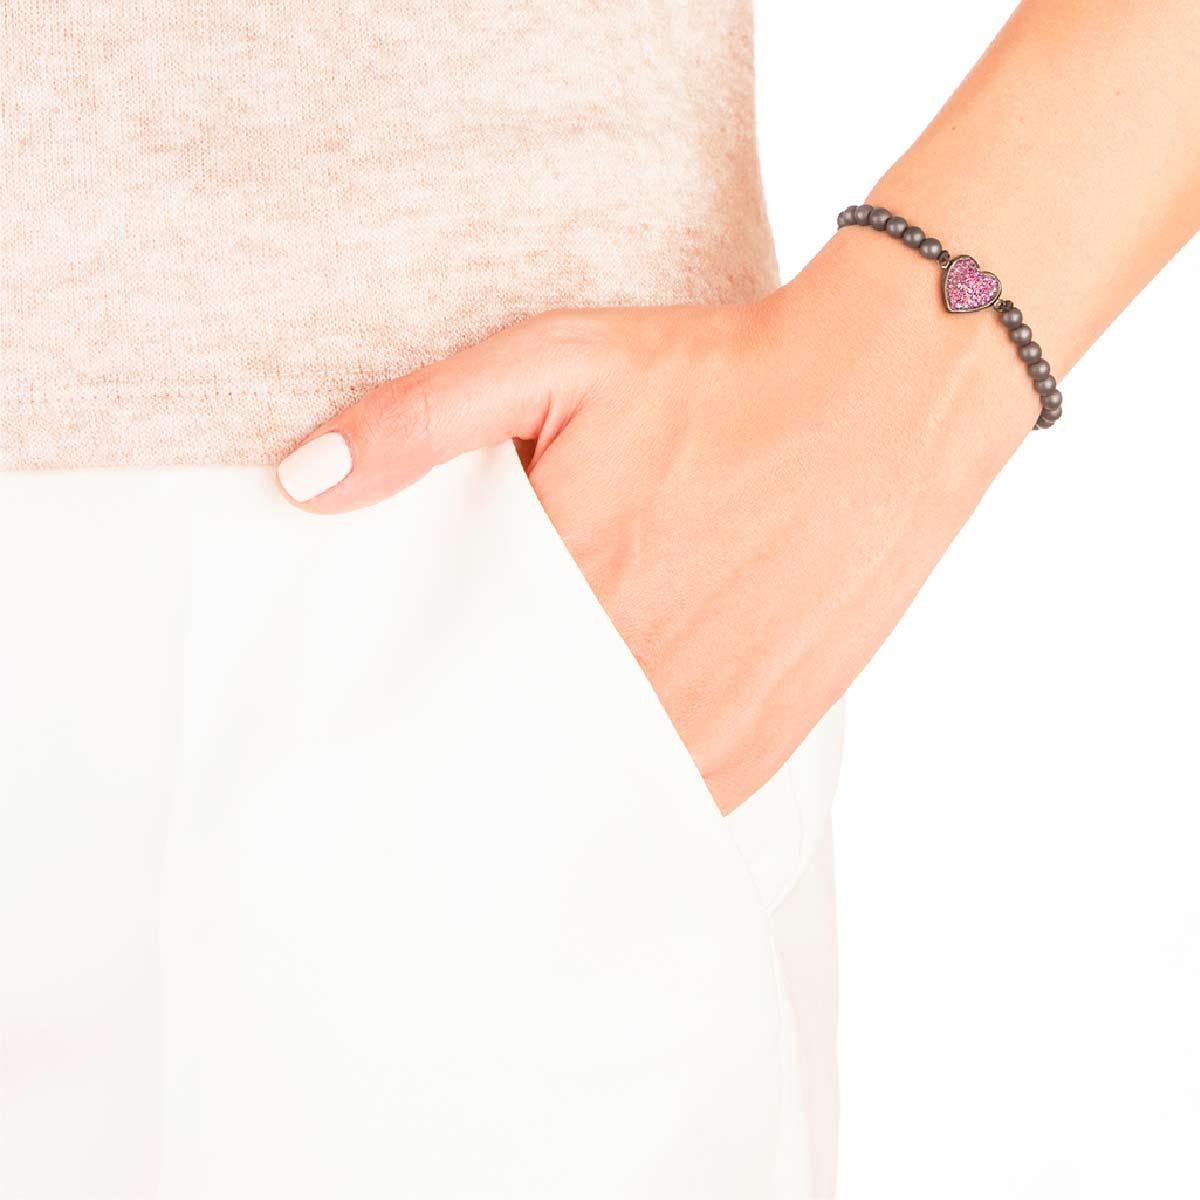 دستبند طلا Black Heart